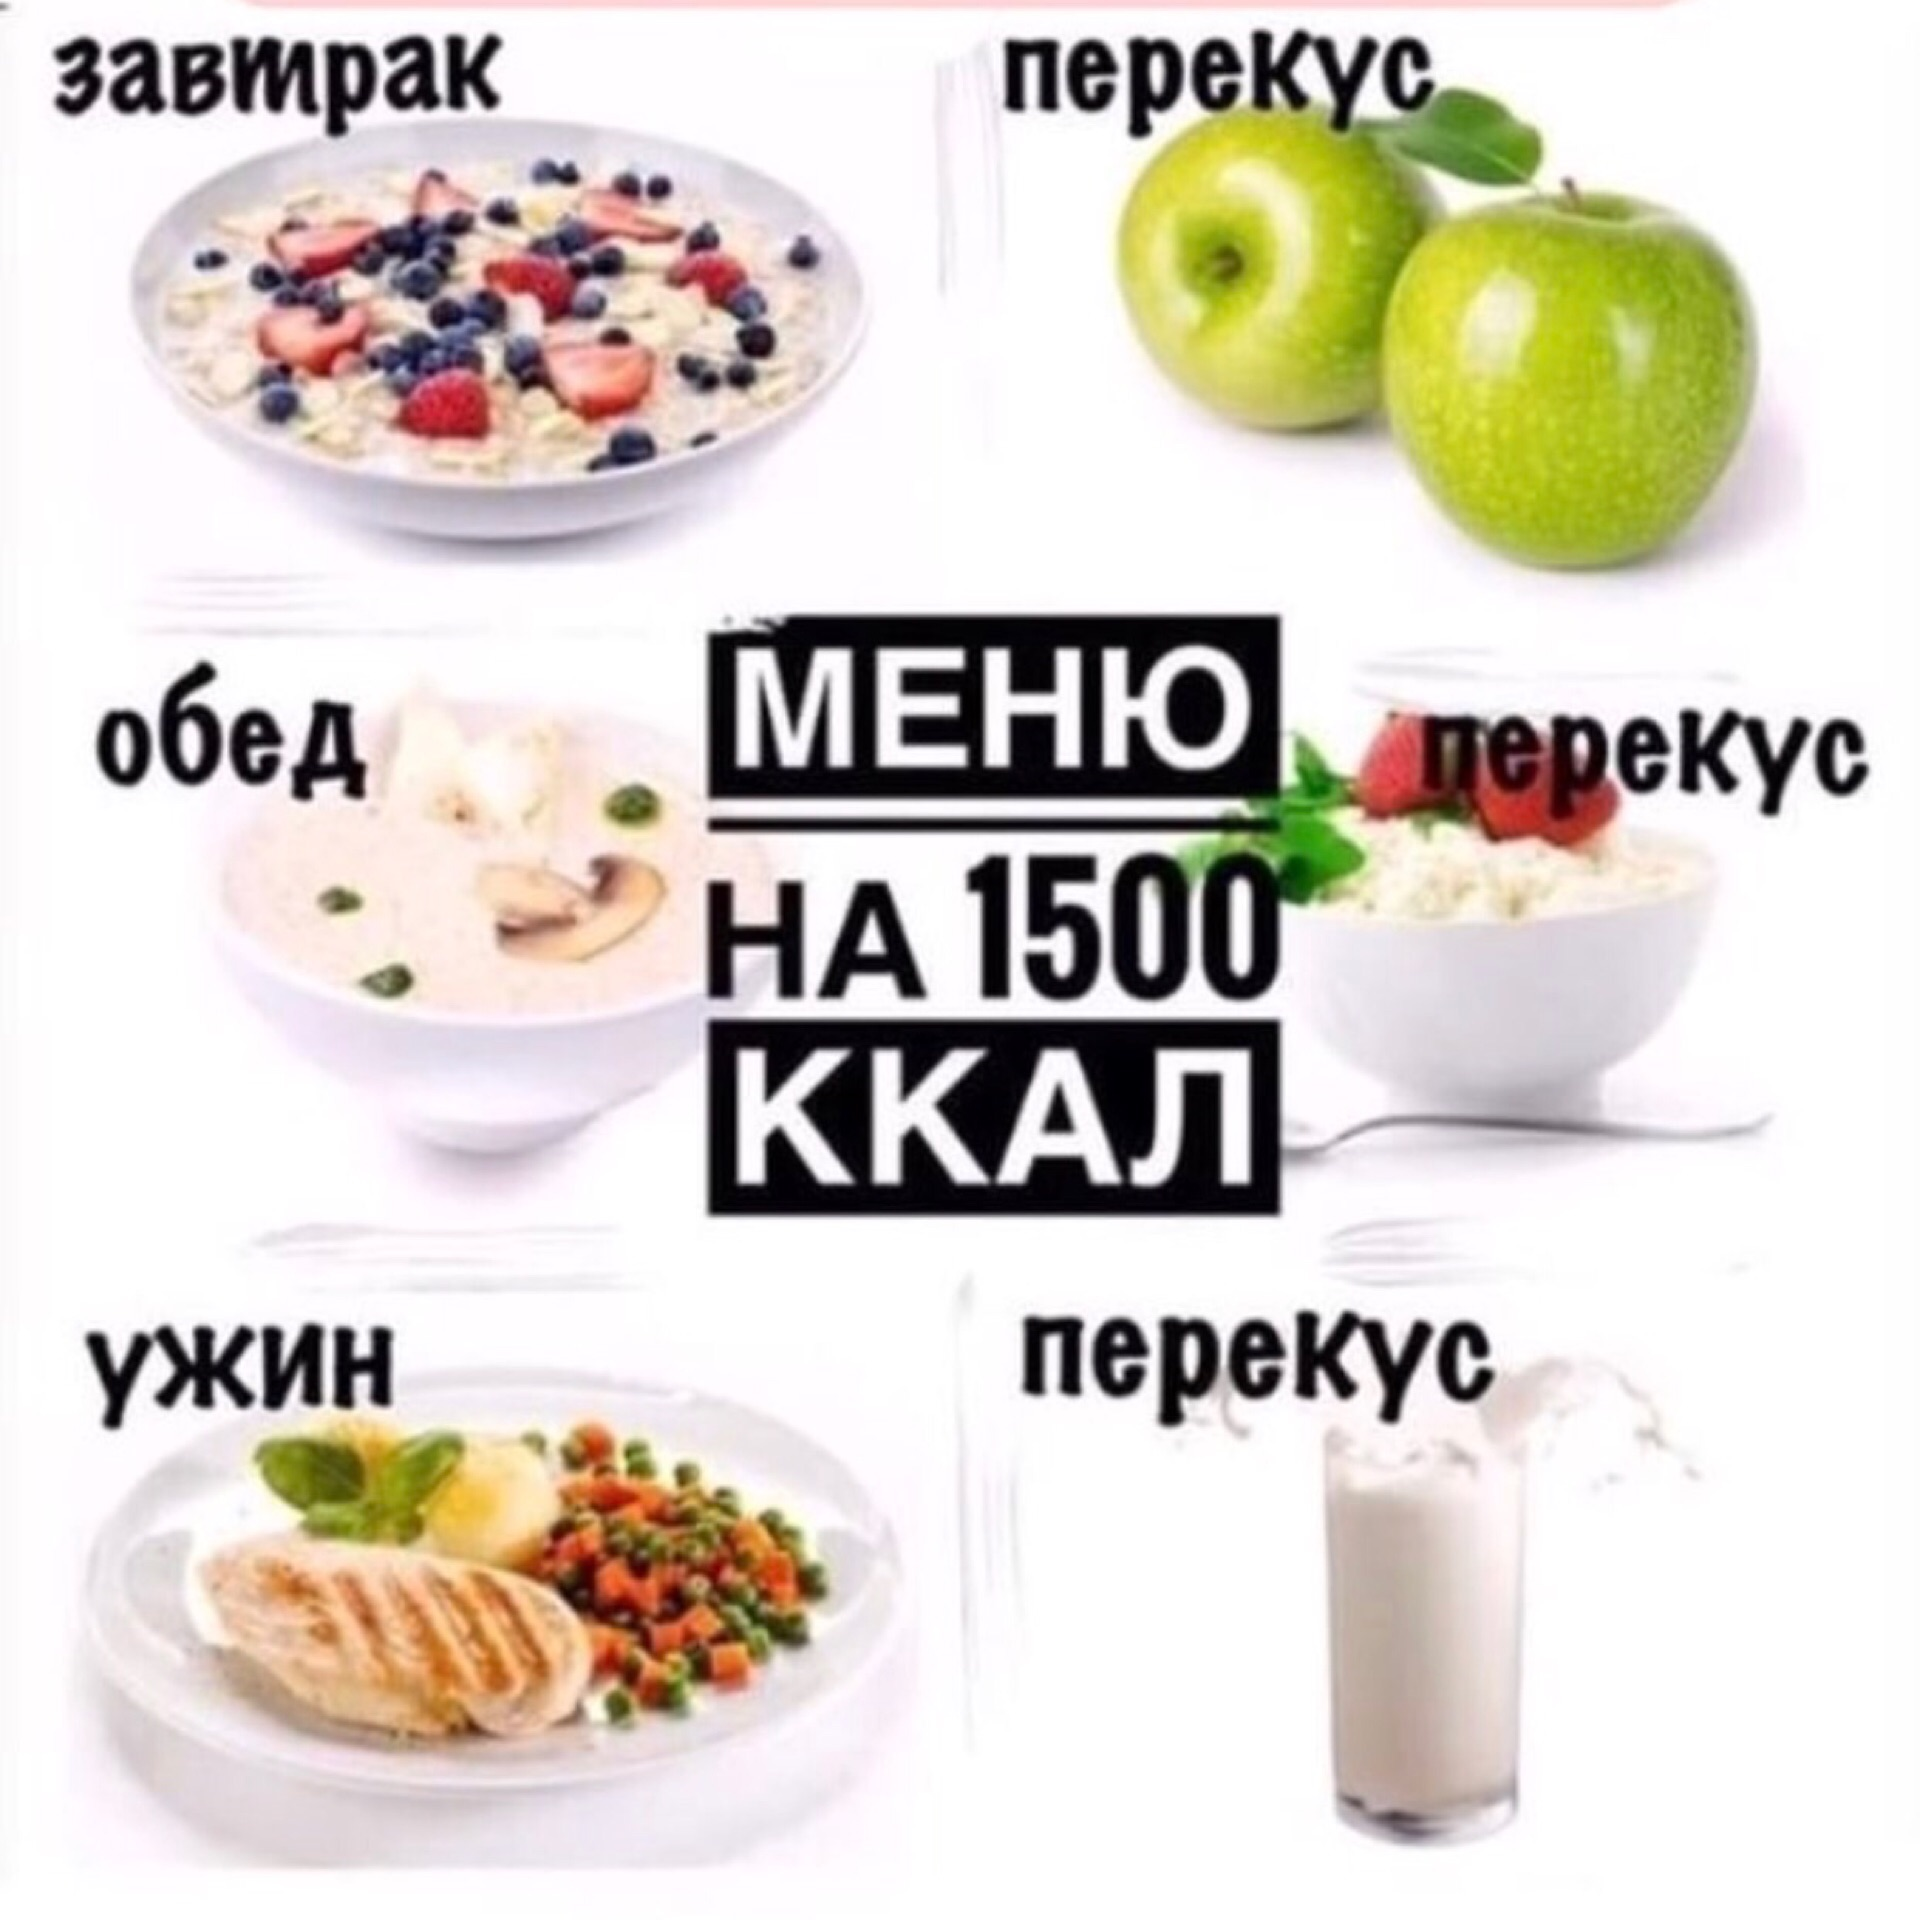 Присмотритесь людям перекус на 100 калорий крючком